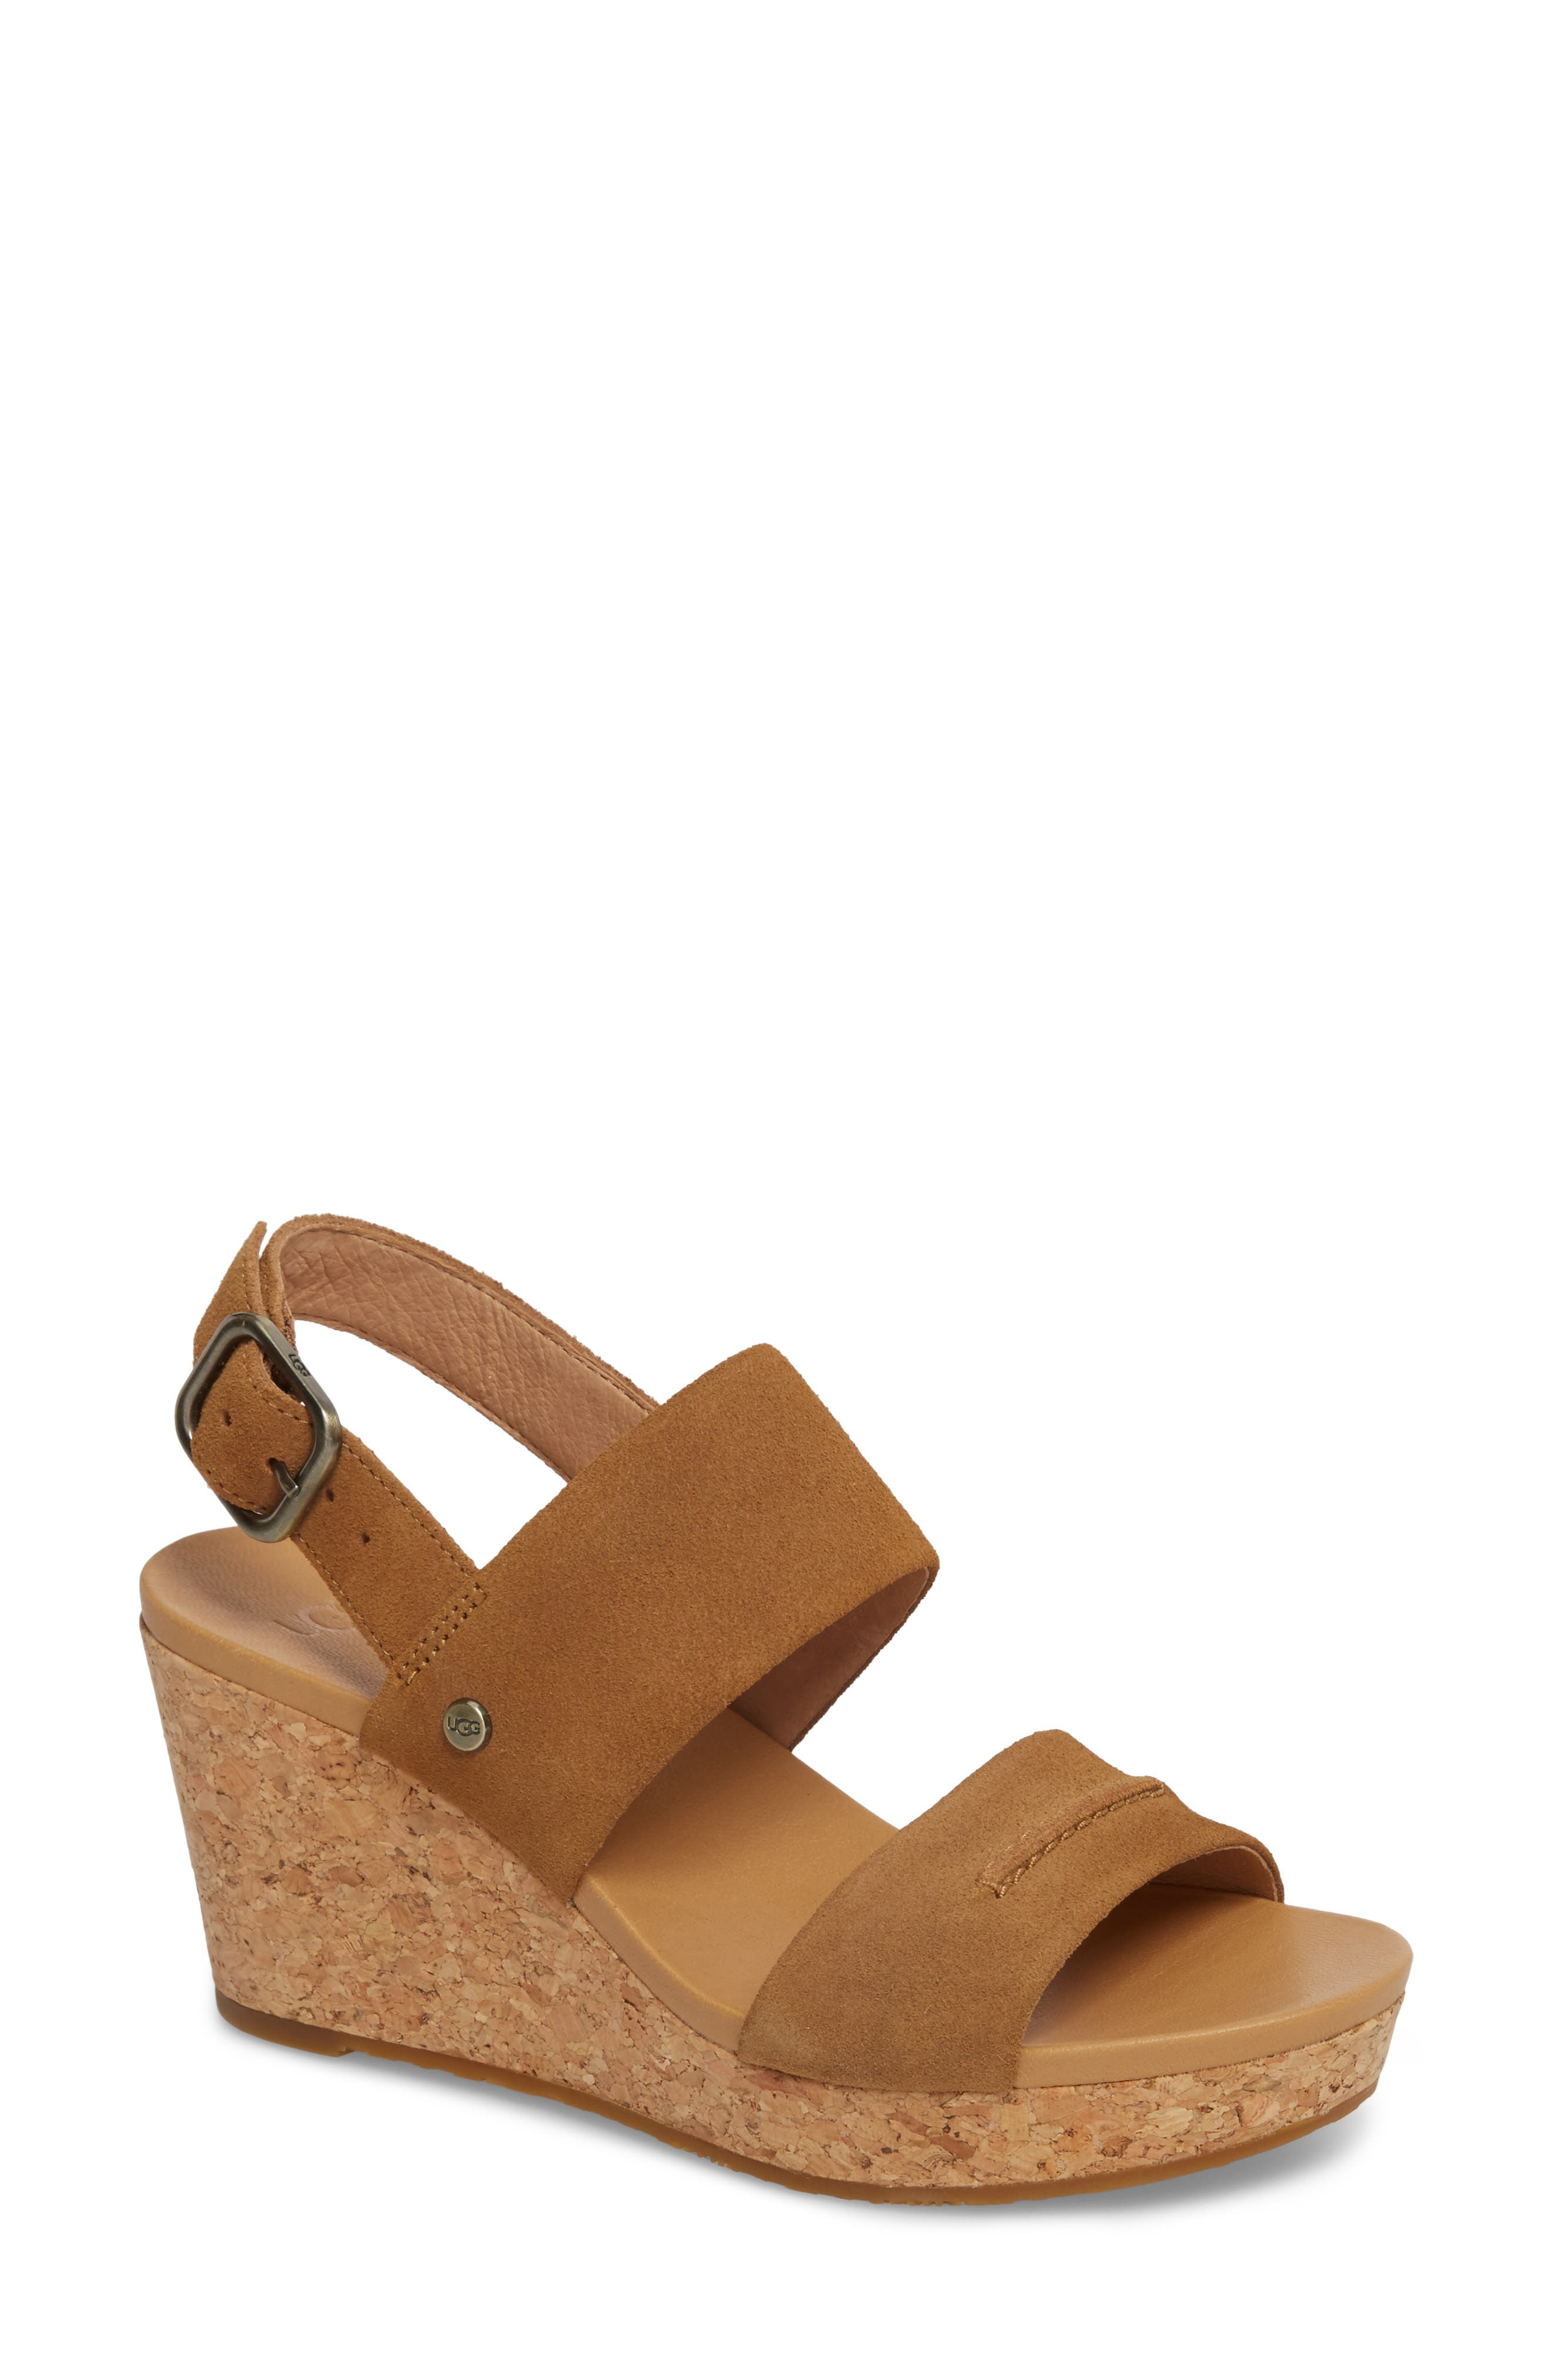 womens sandals sandal comforter arielle wedge latte worldwide comfort aetrex